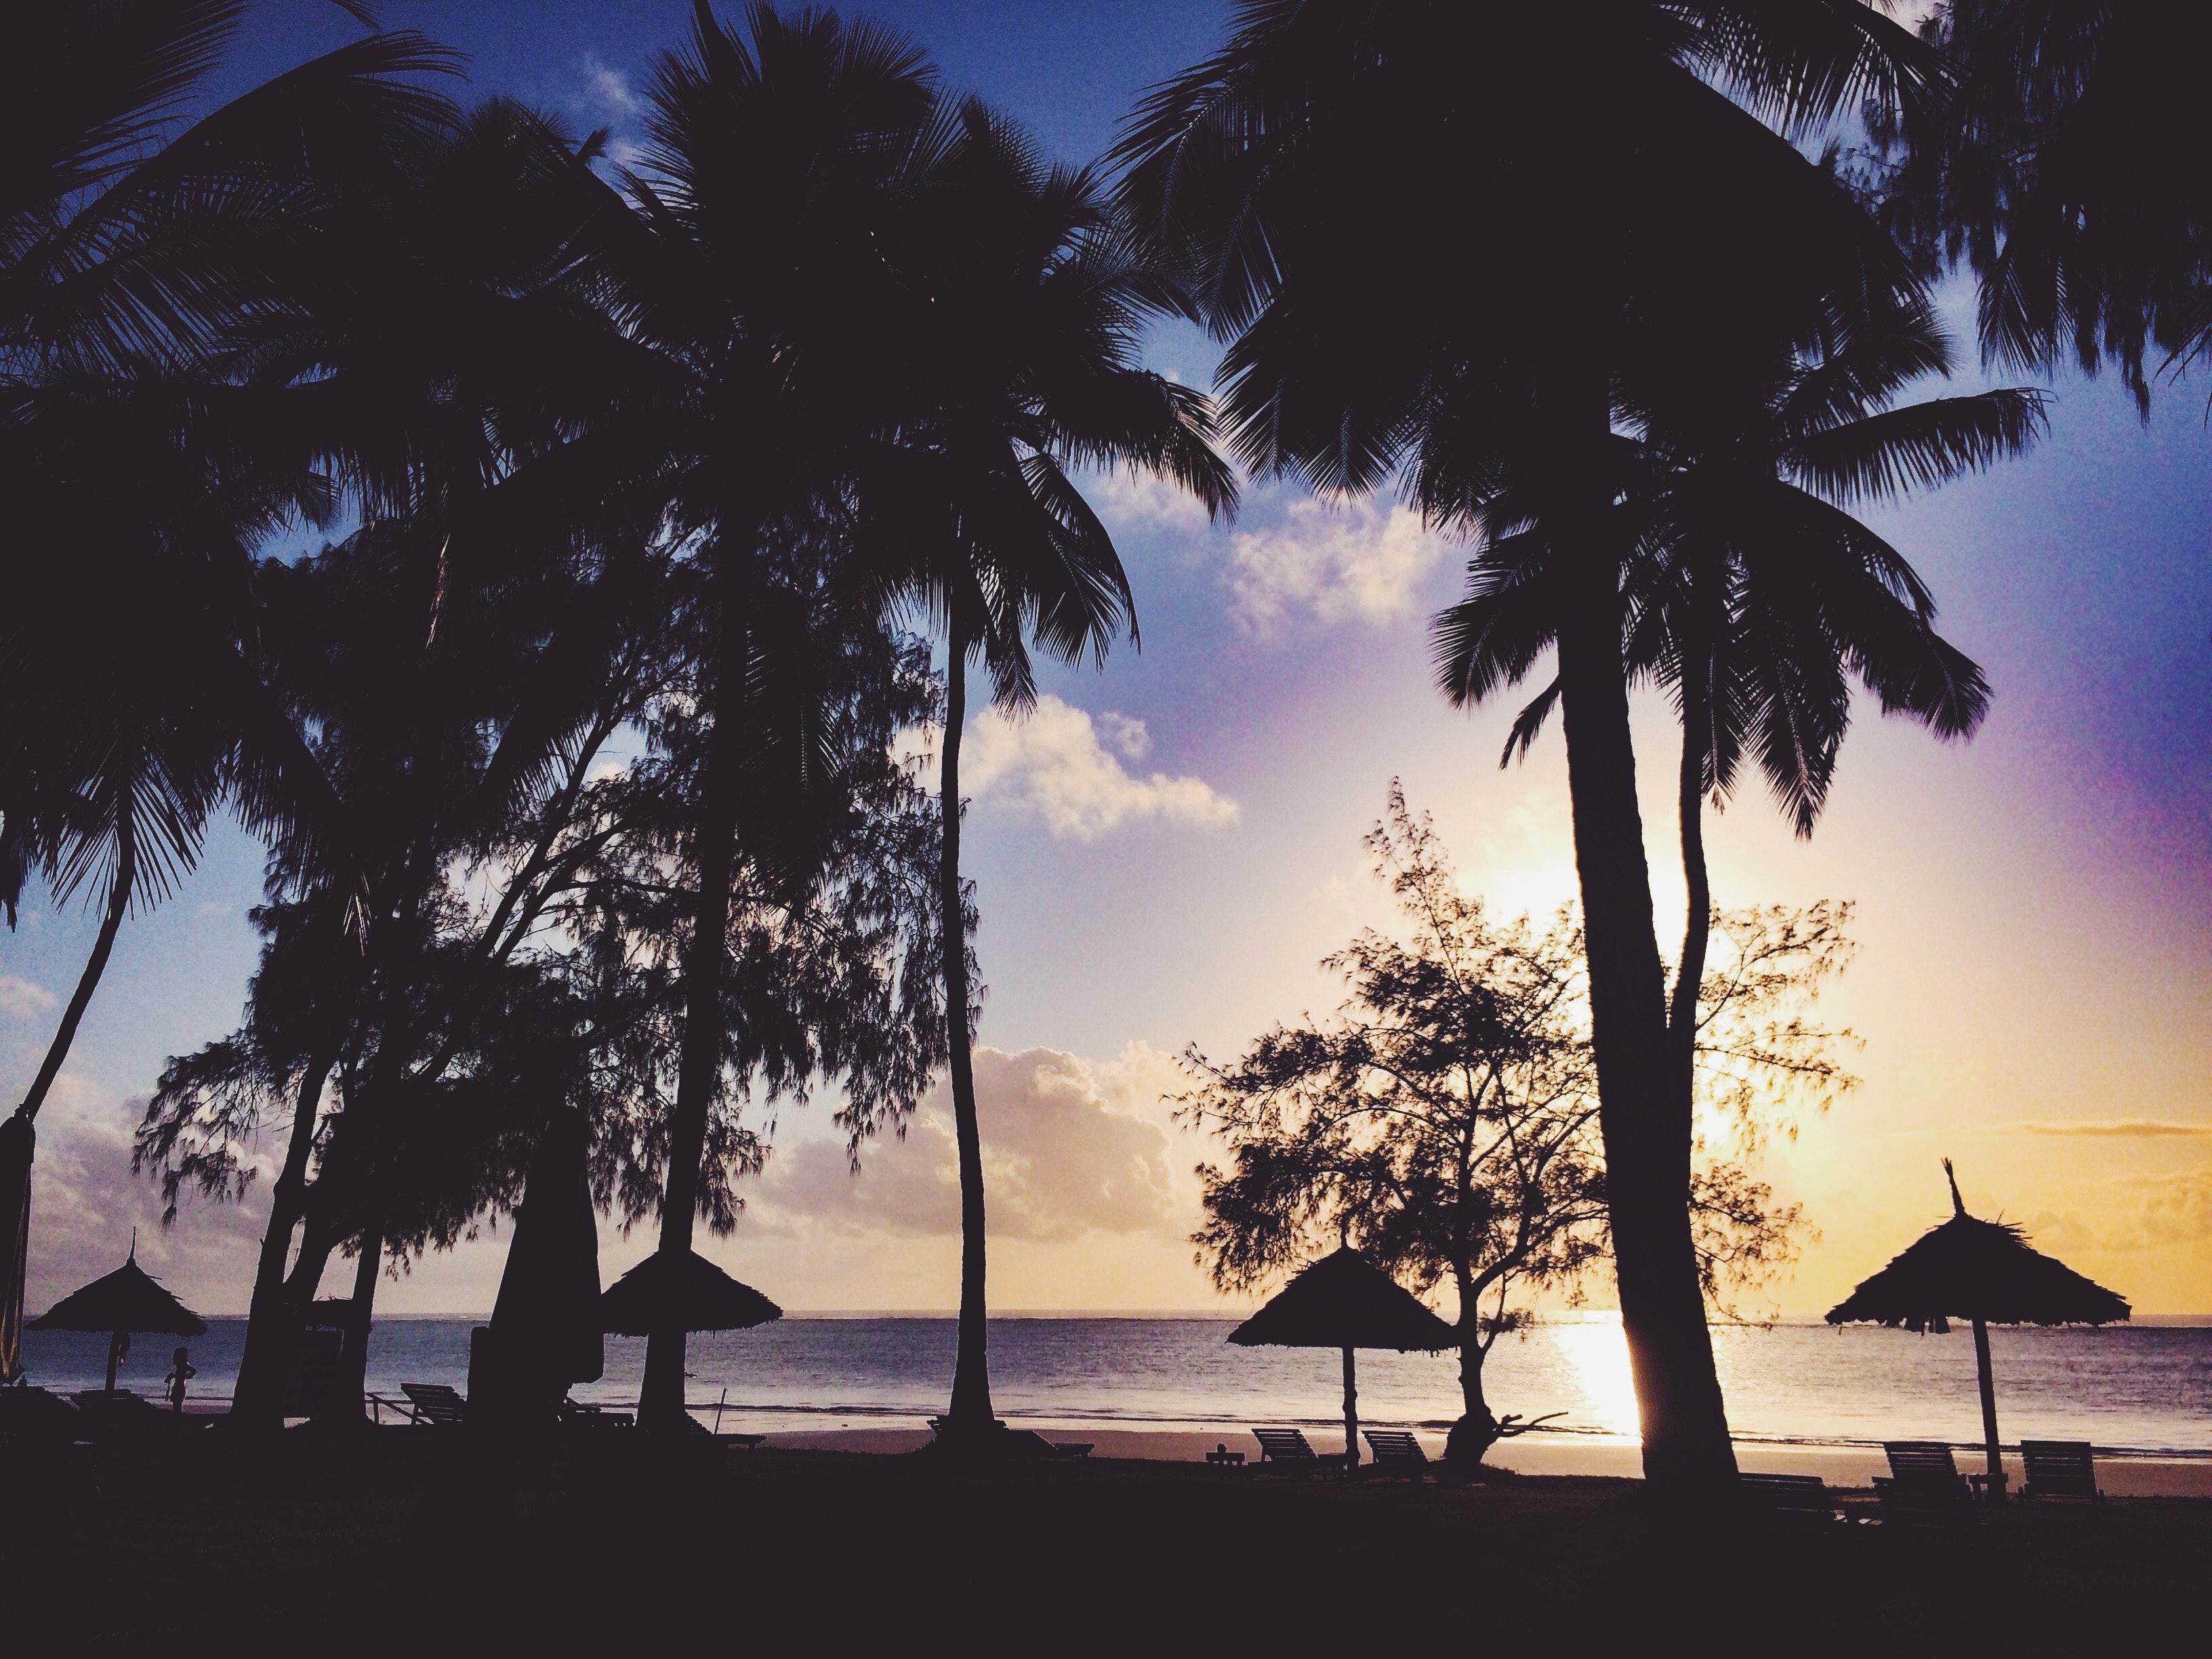 Silhouette Photo Of Trees, Backlit, Beach, Dawn, Dusk, HQ Photo